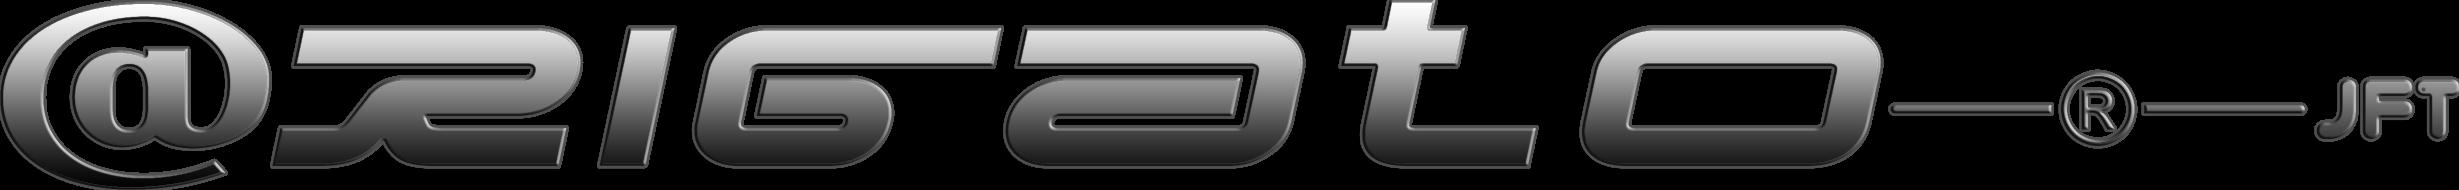 arigato_logo_600.png